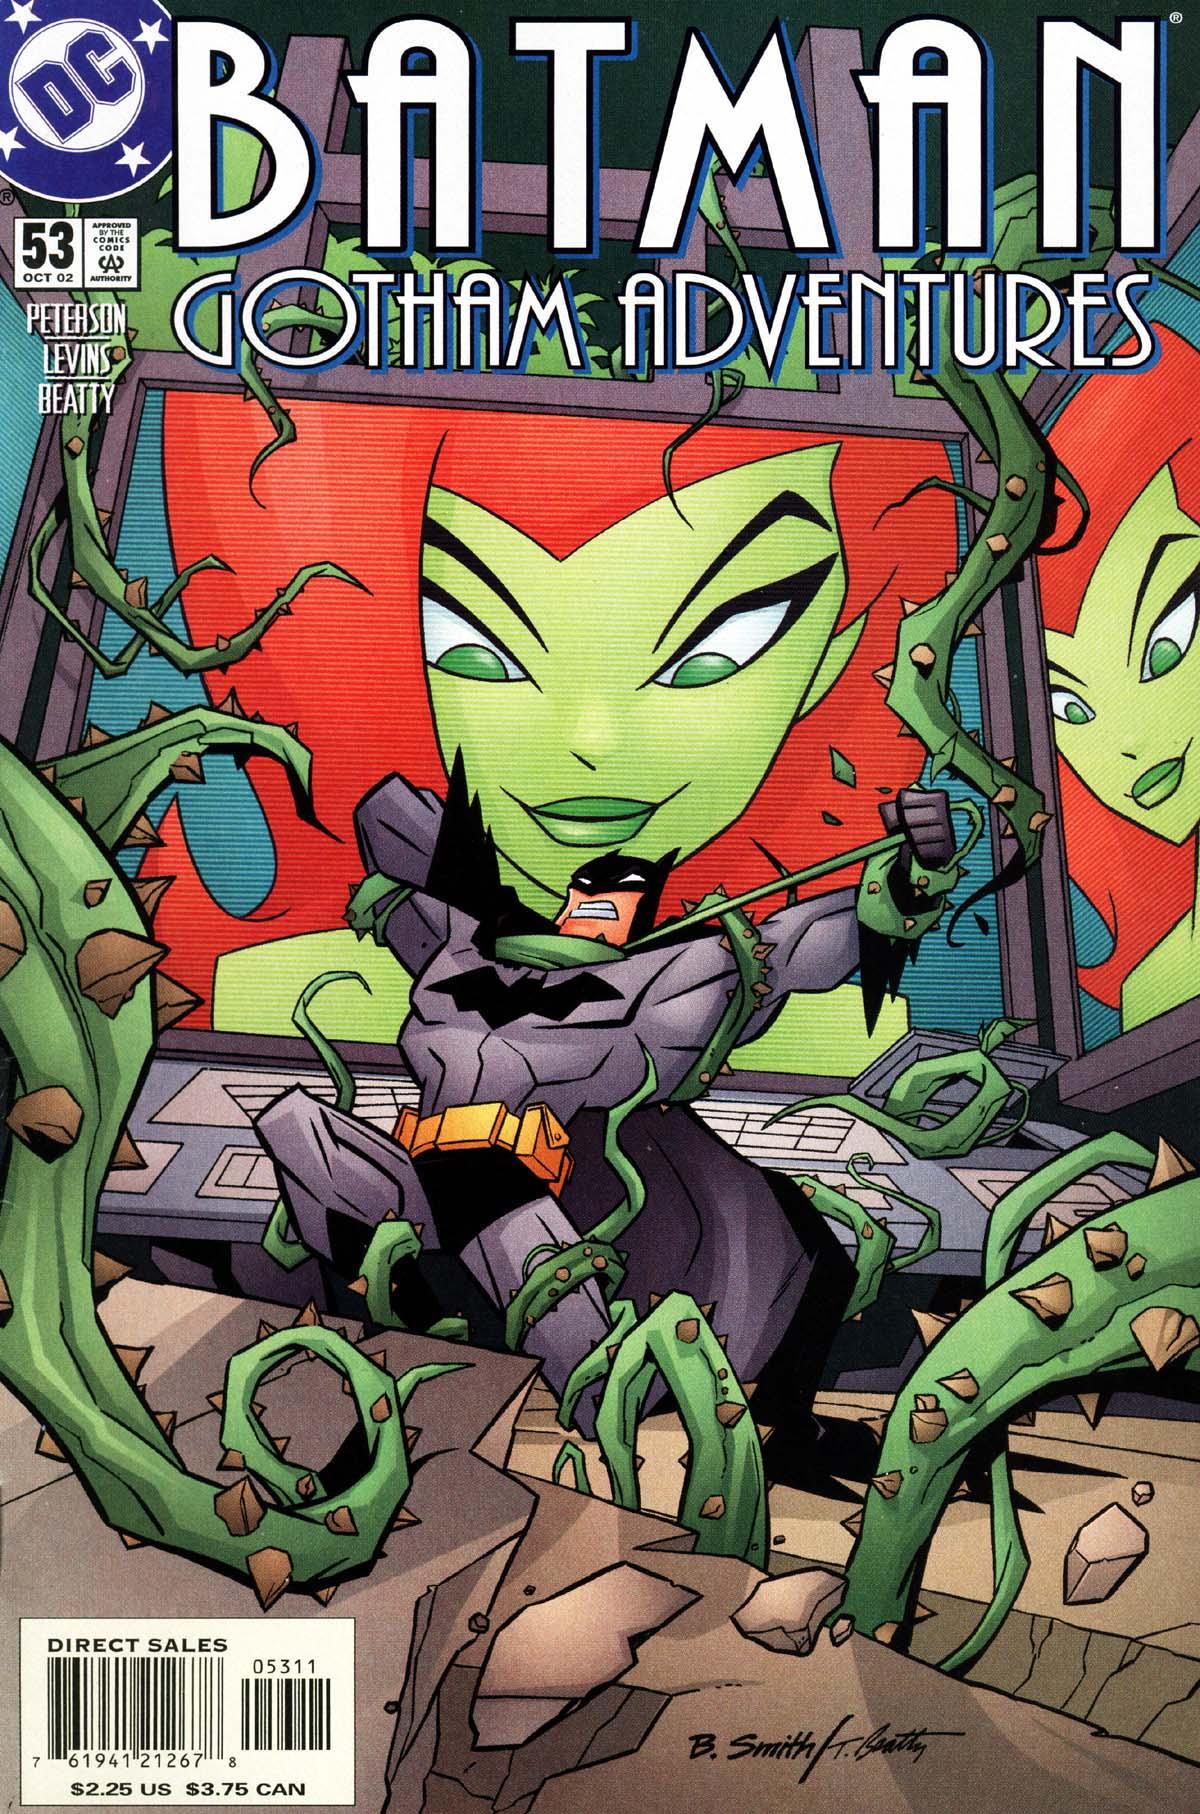 Batman: Gotham Adventures 53 Page 1